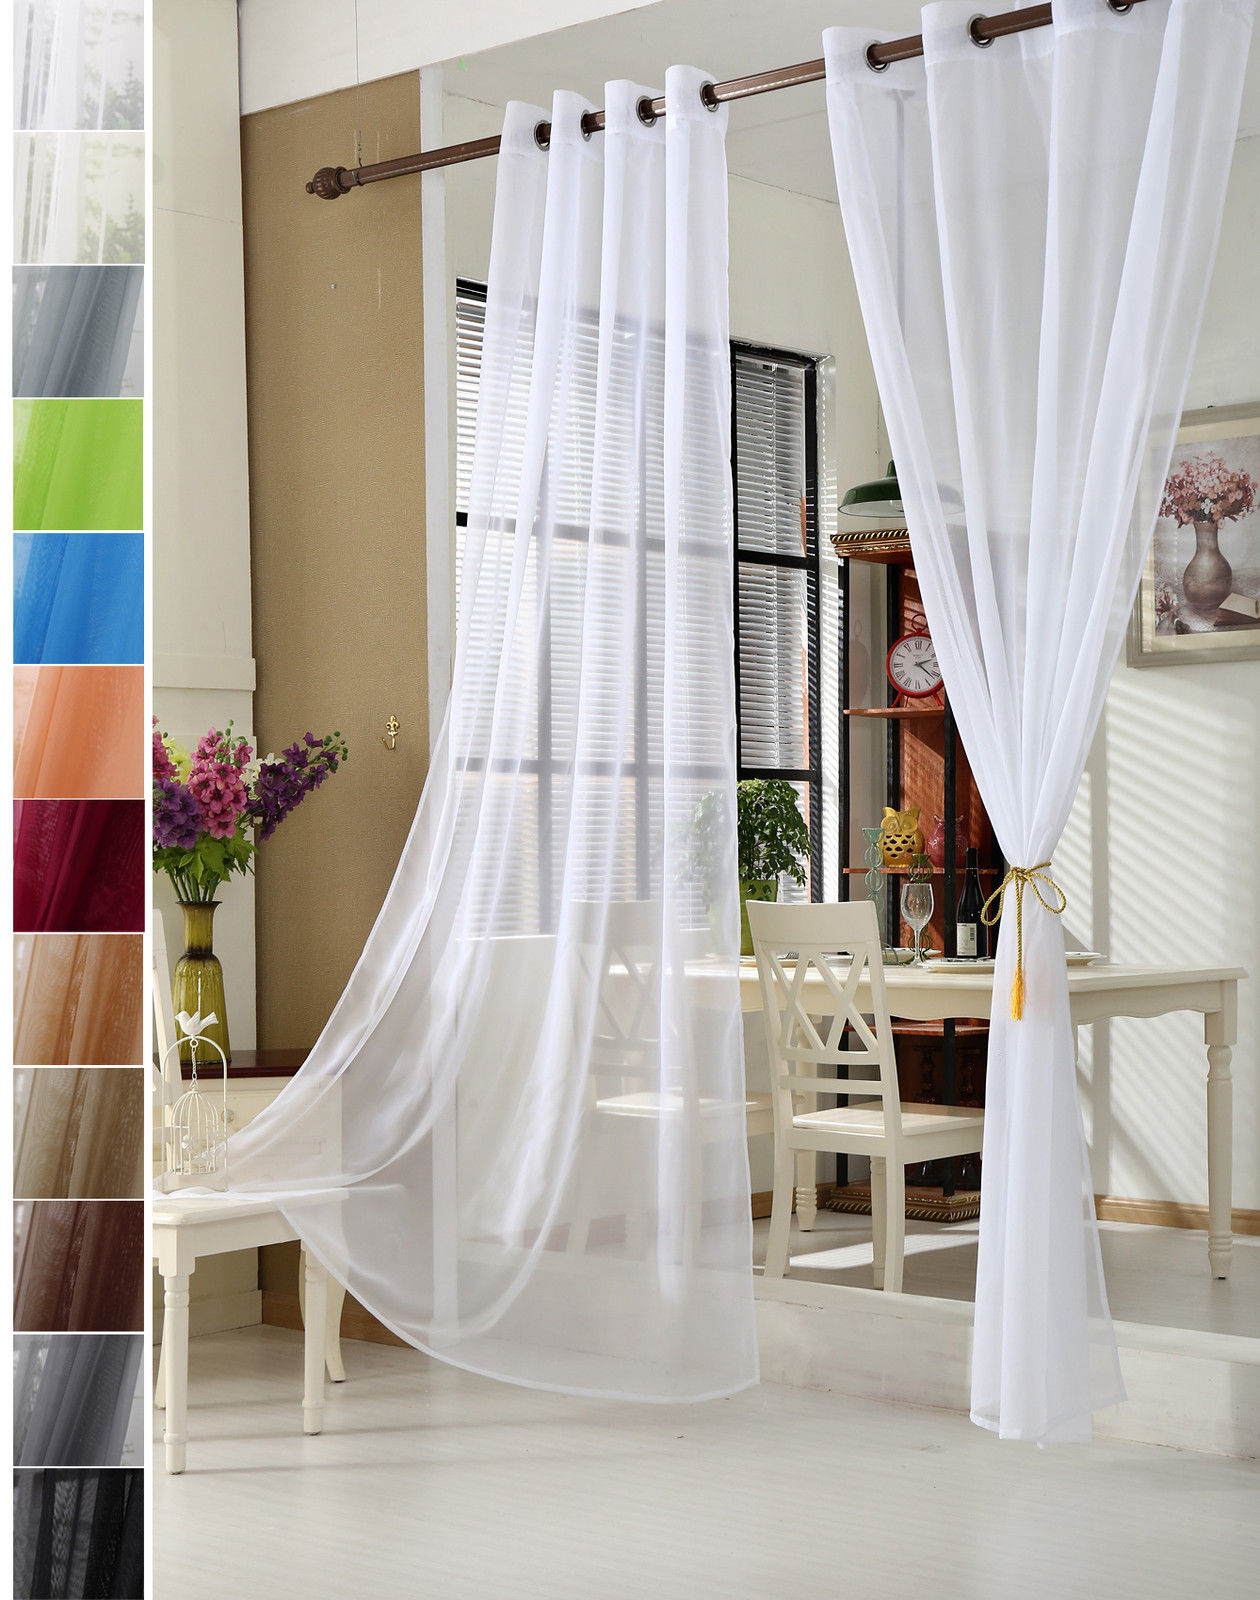 1 pi ce rideau transparent avec oeillets taille 140x245cm f081 ebay. Black Bedroom Furniture Sets. Home Design Ideas